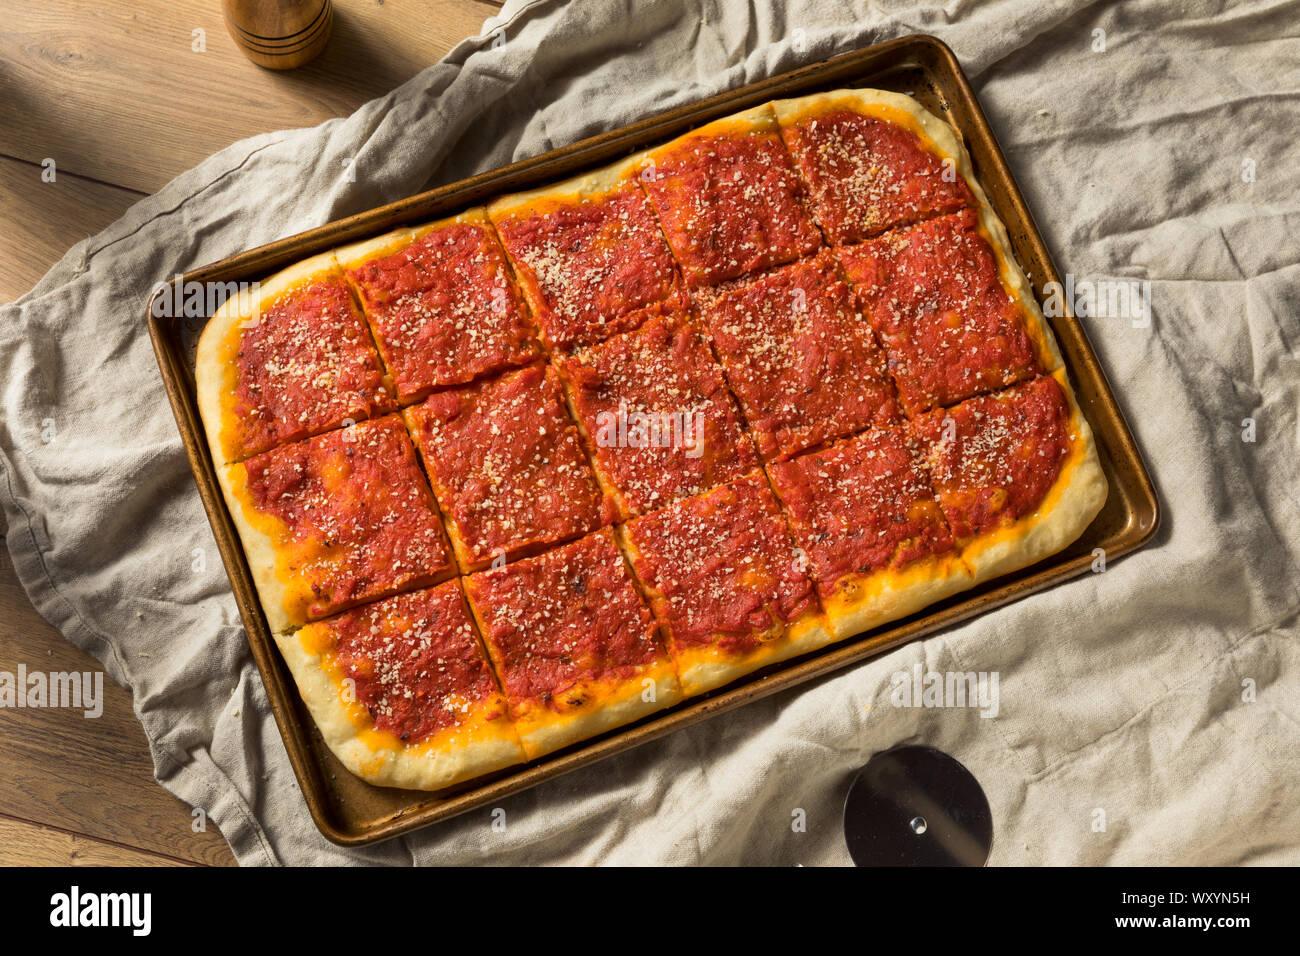 Homemade Philadelphia Tomato Pie With Grated Cheese Stock Photo Alamy